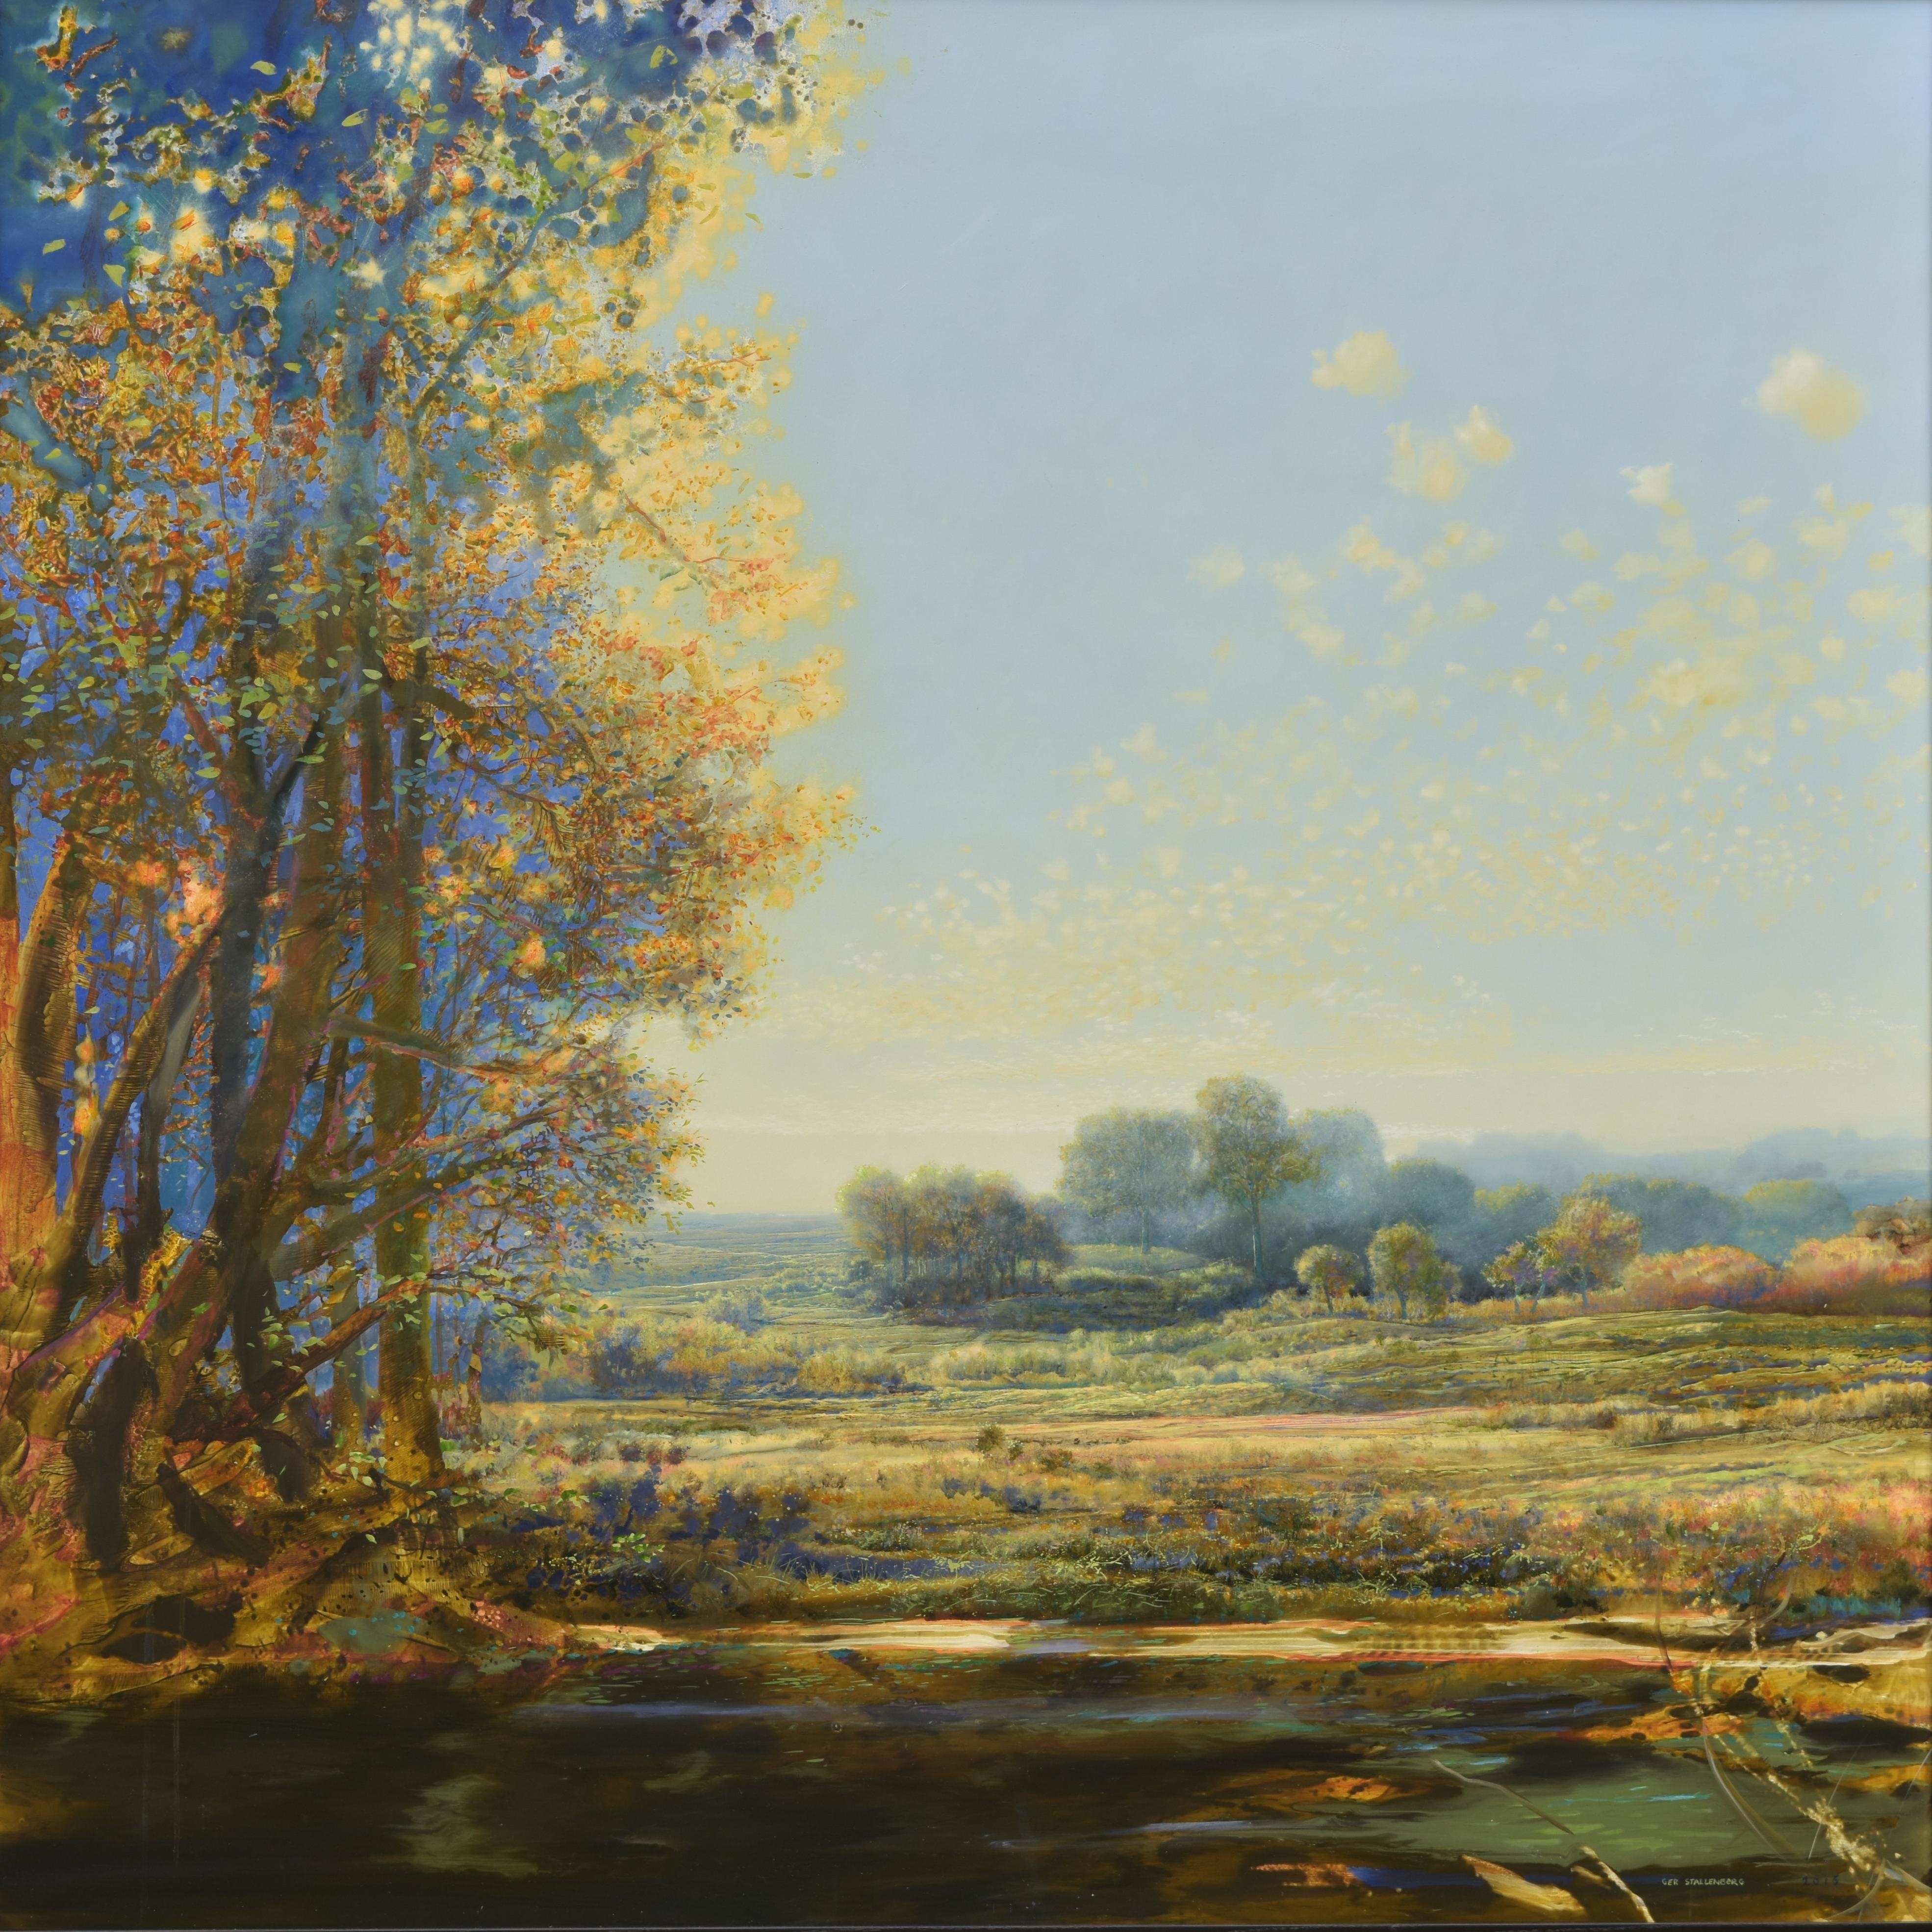 Next Step- 21st Century Contemporary Colorful Landscape Painting